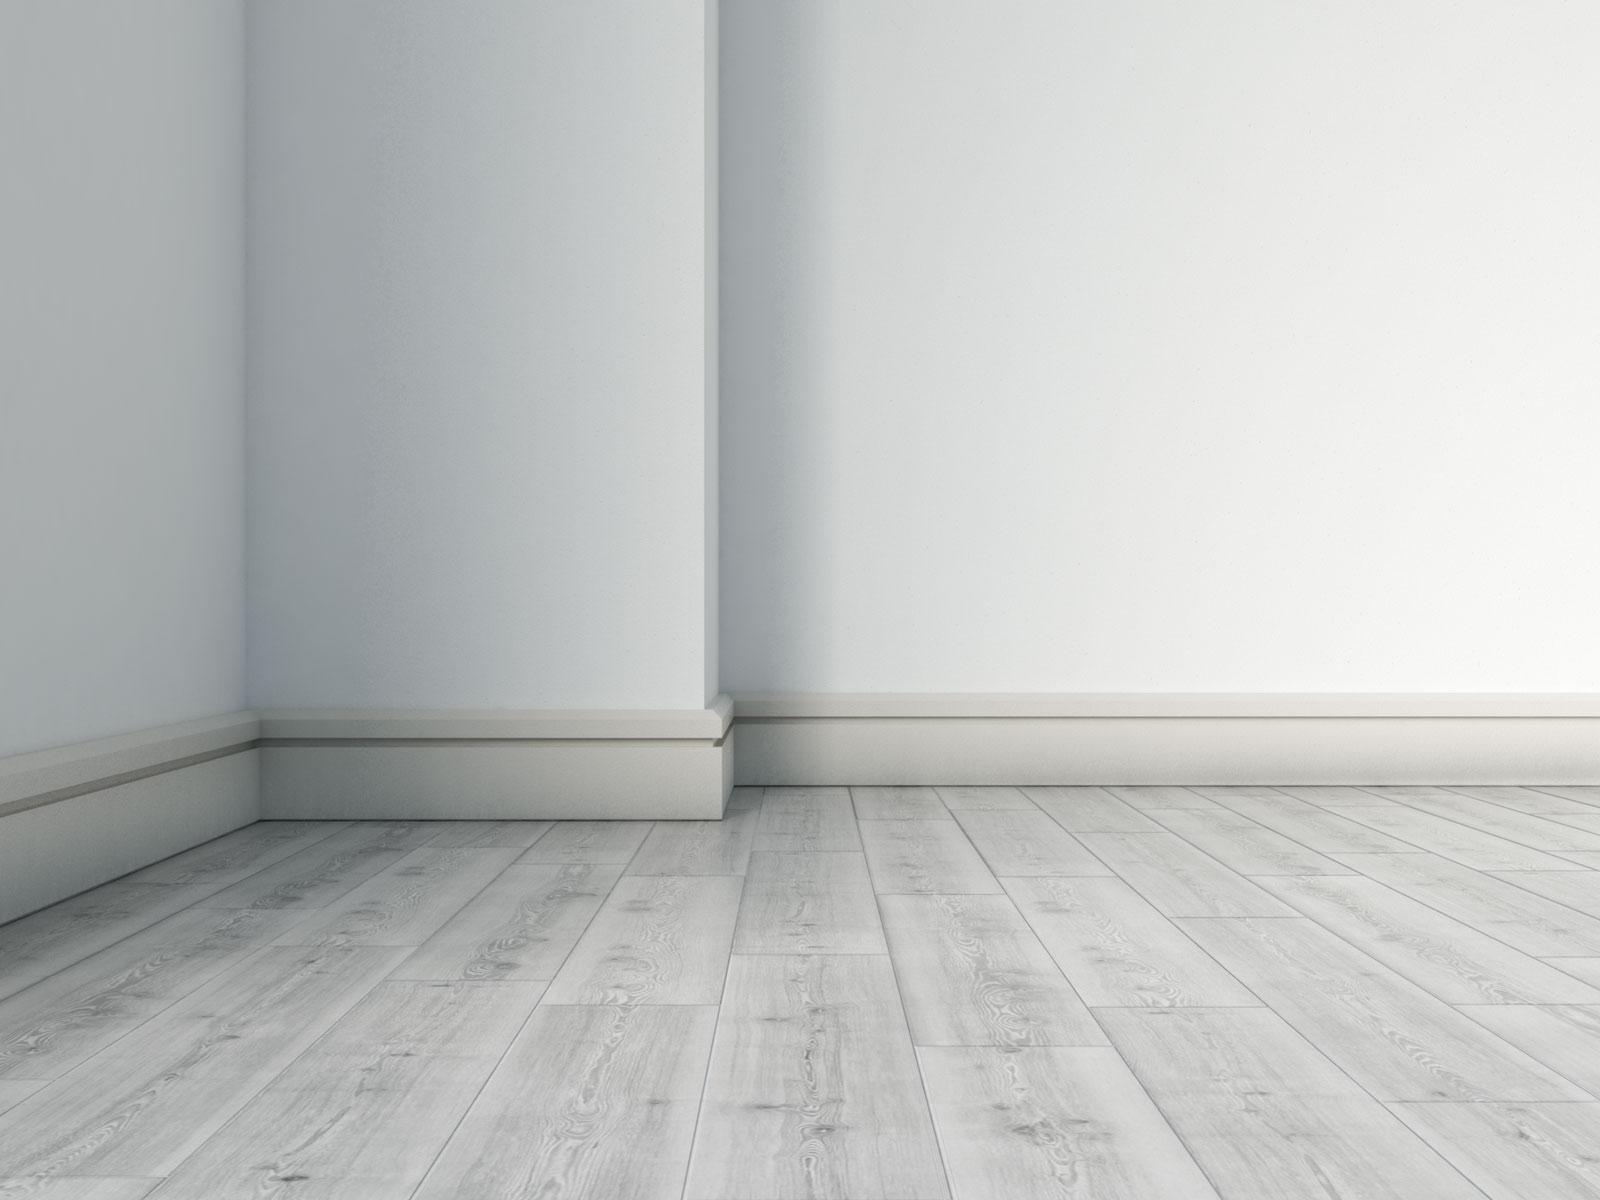 Beige baseboard with gray wood floors